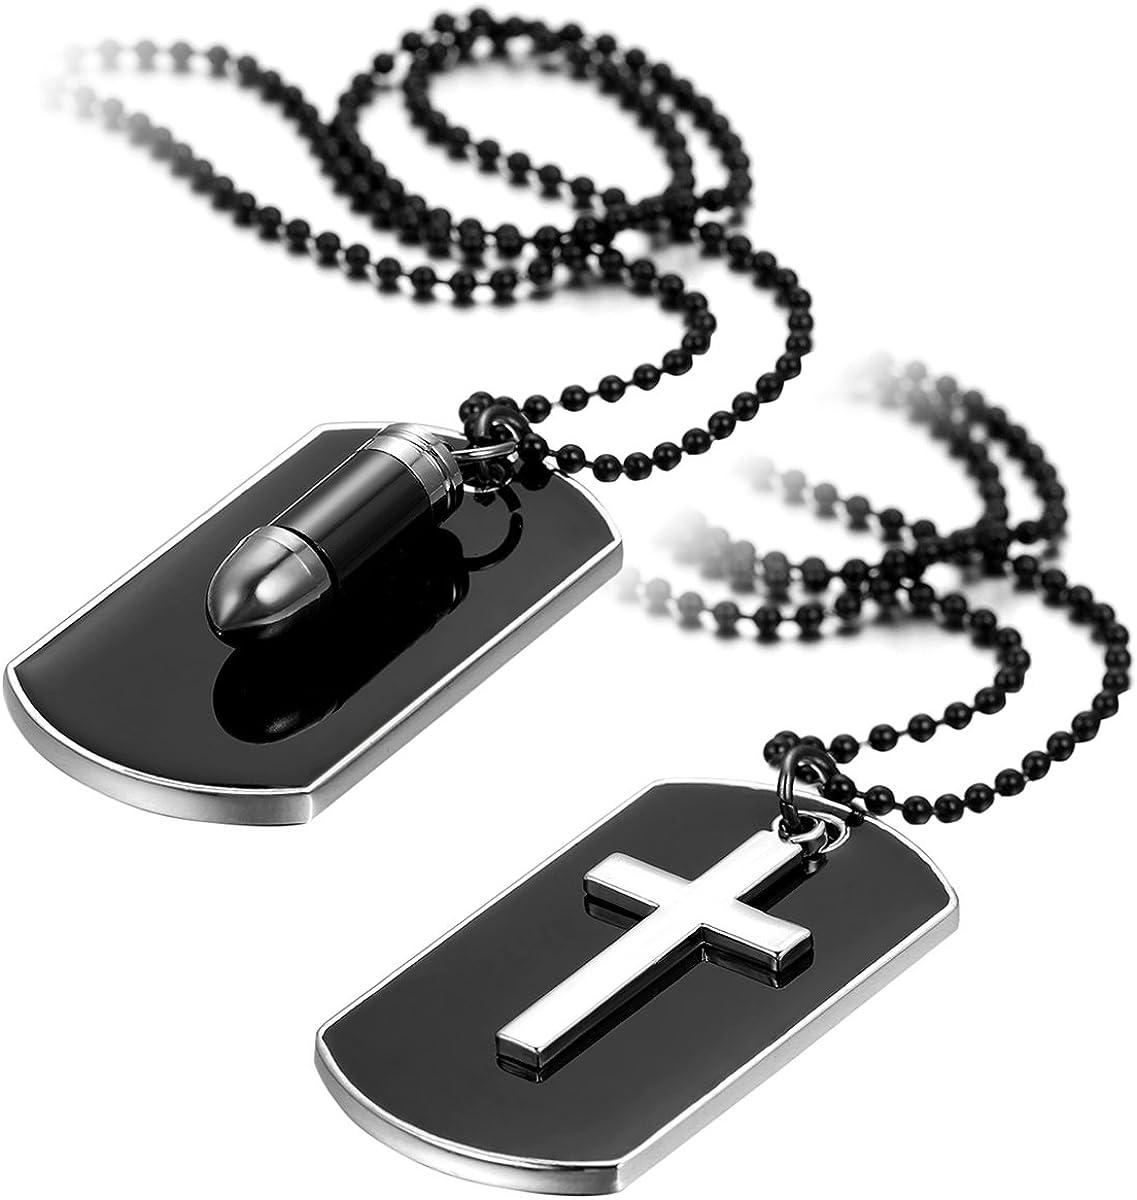 Oidea 2pcs Assorted Mens Black Biker Cross Bullet Dog Tag Pendant Necklace,27 Chain